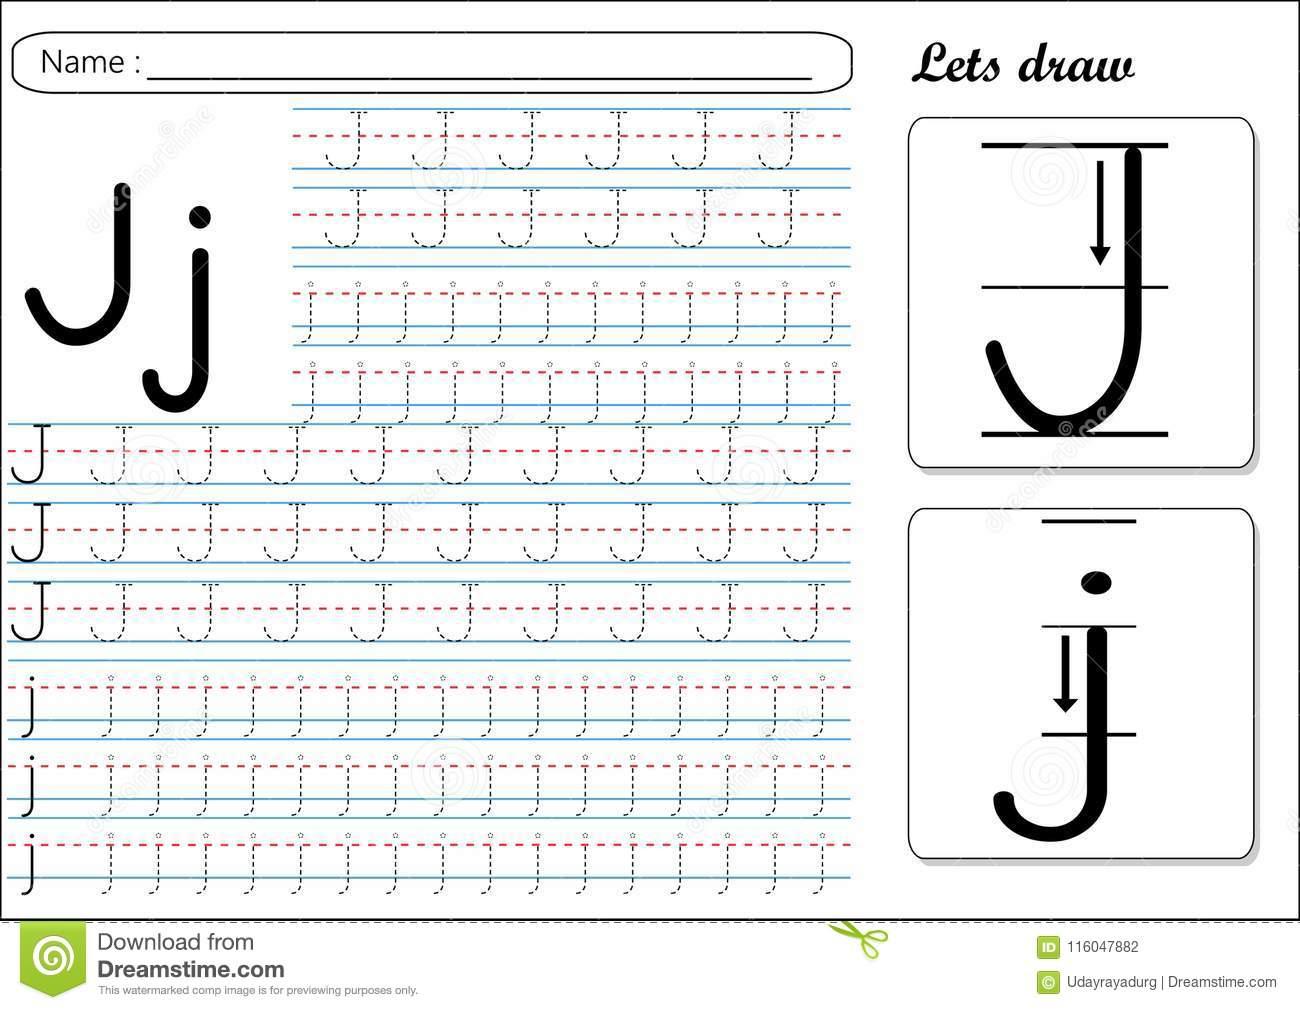 Tracing Worksheet -Jj Stock Vector. Illustration Of Spelling in Alphabet J Tracing